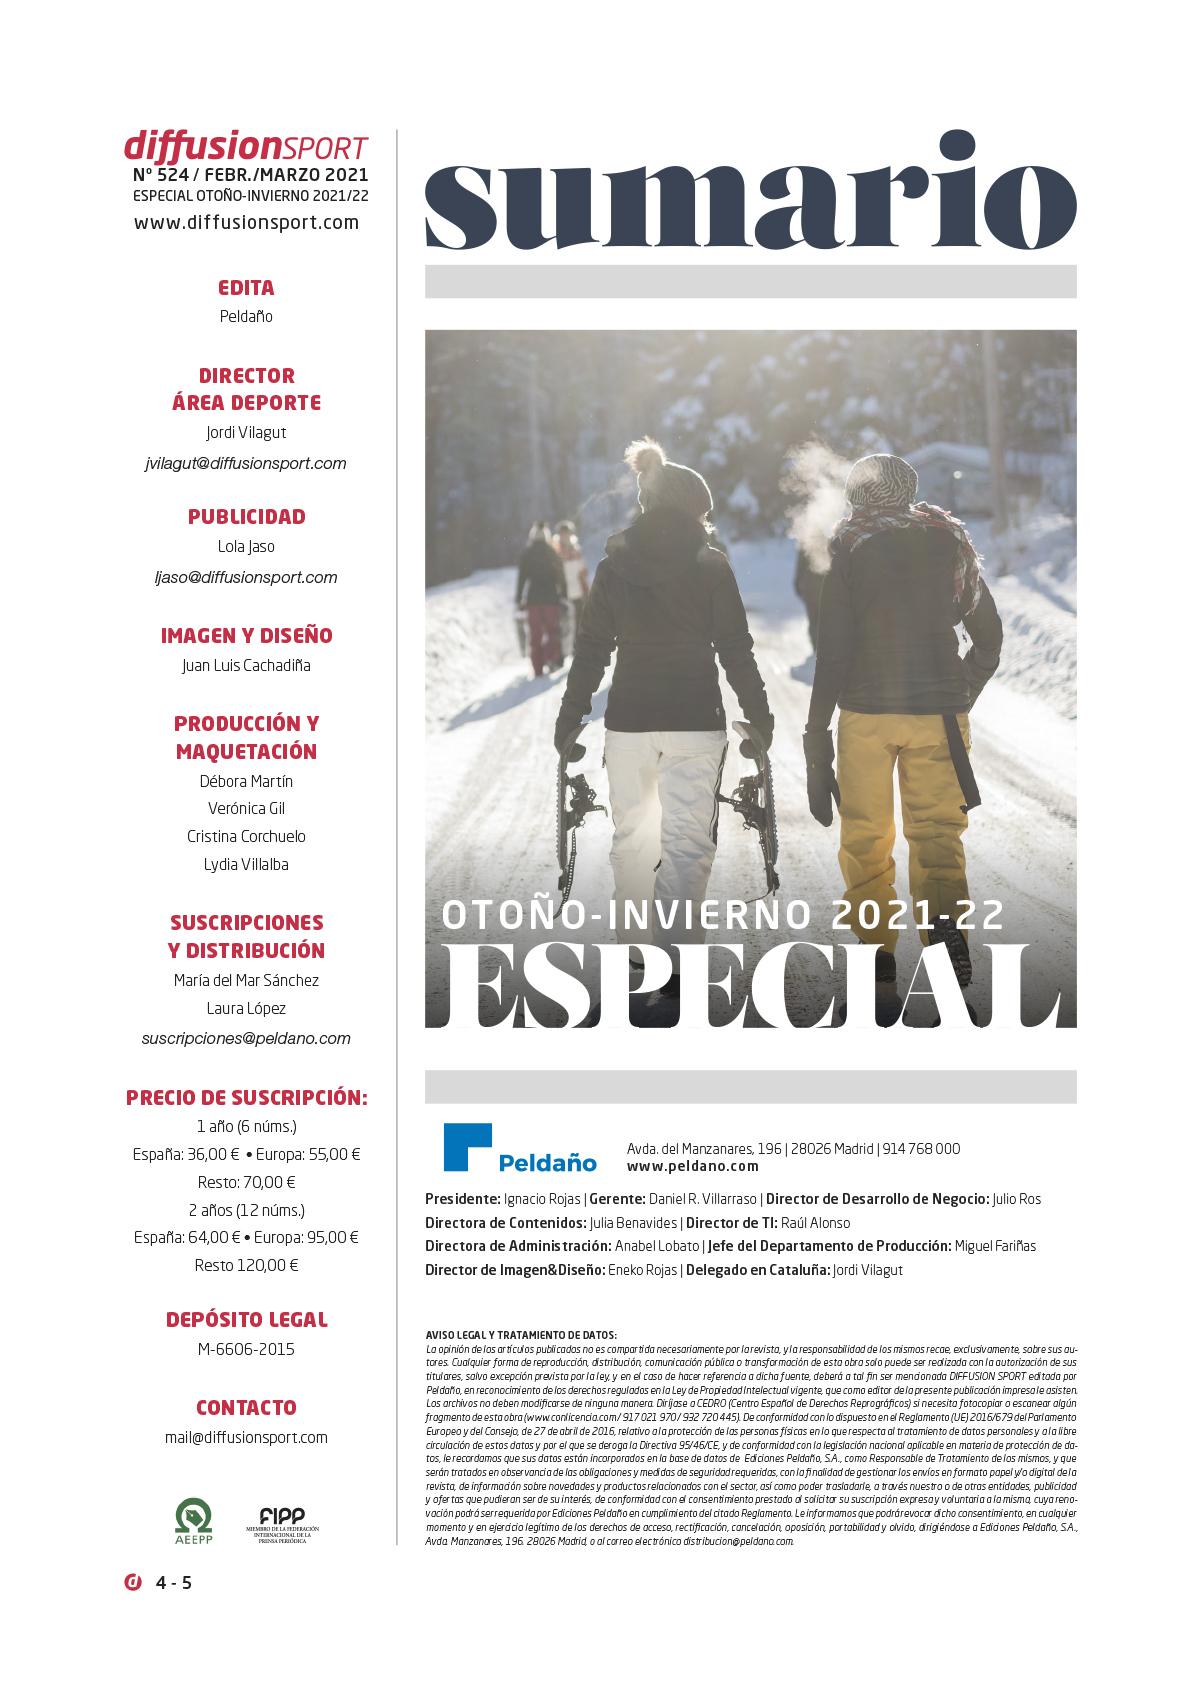 Diffusion Sport Nº 524